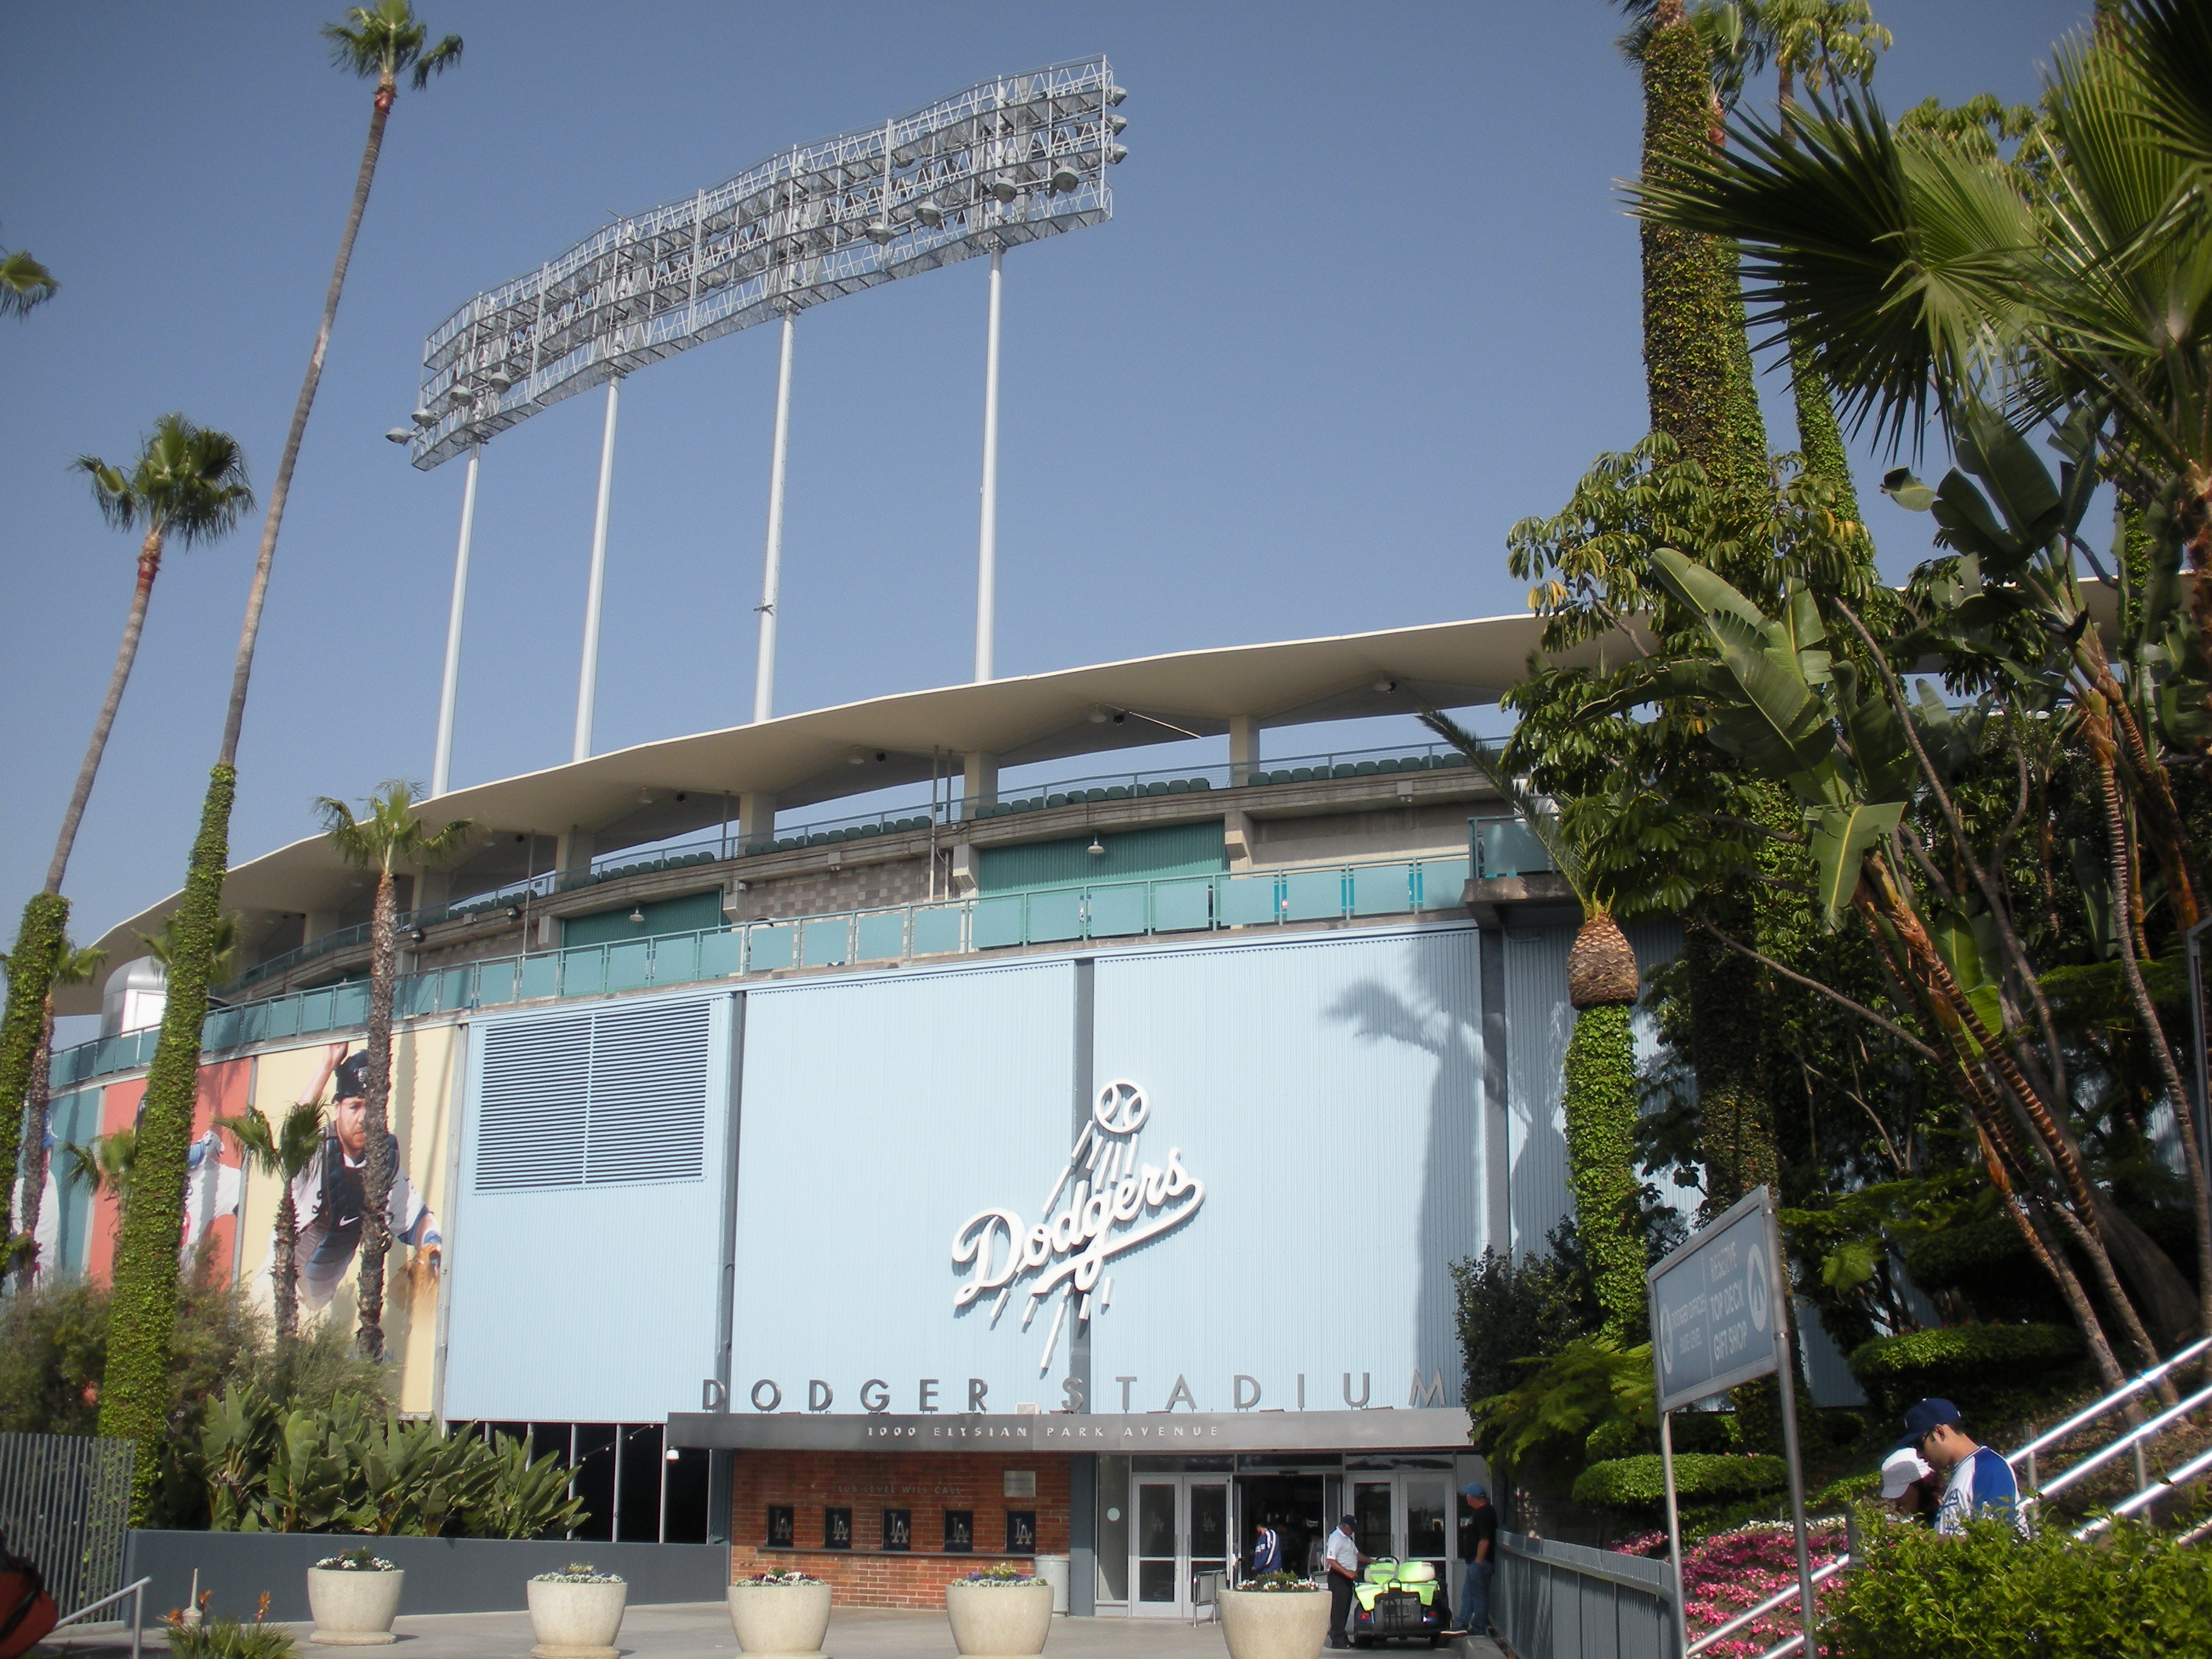 operation outfield infiltrate dodger stadium original stadium concept art today